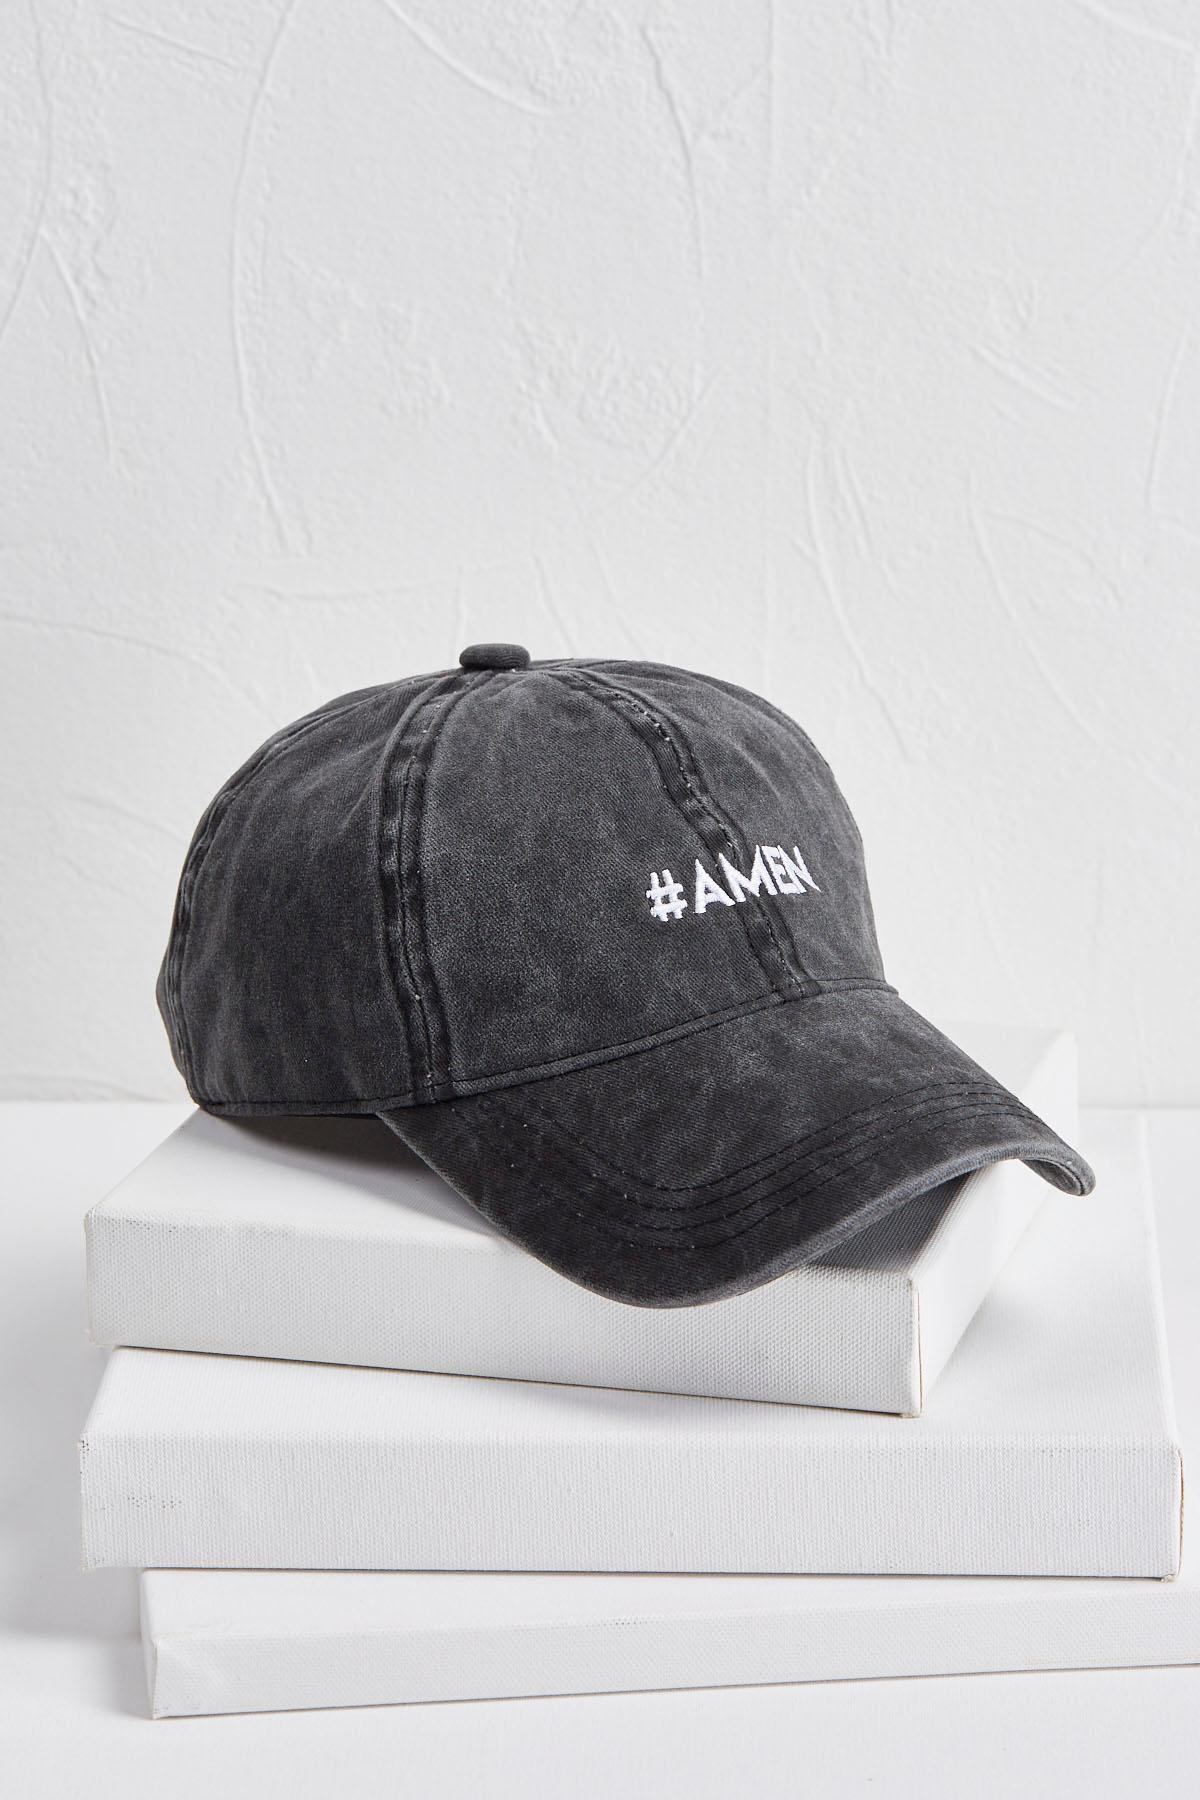 Hashtag Amen Baseball Hat